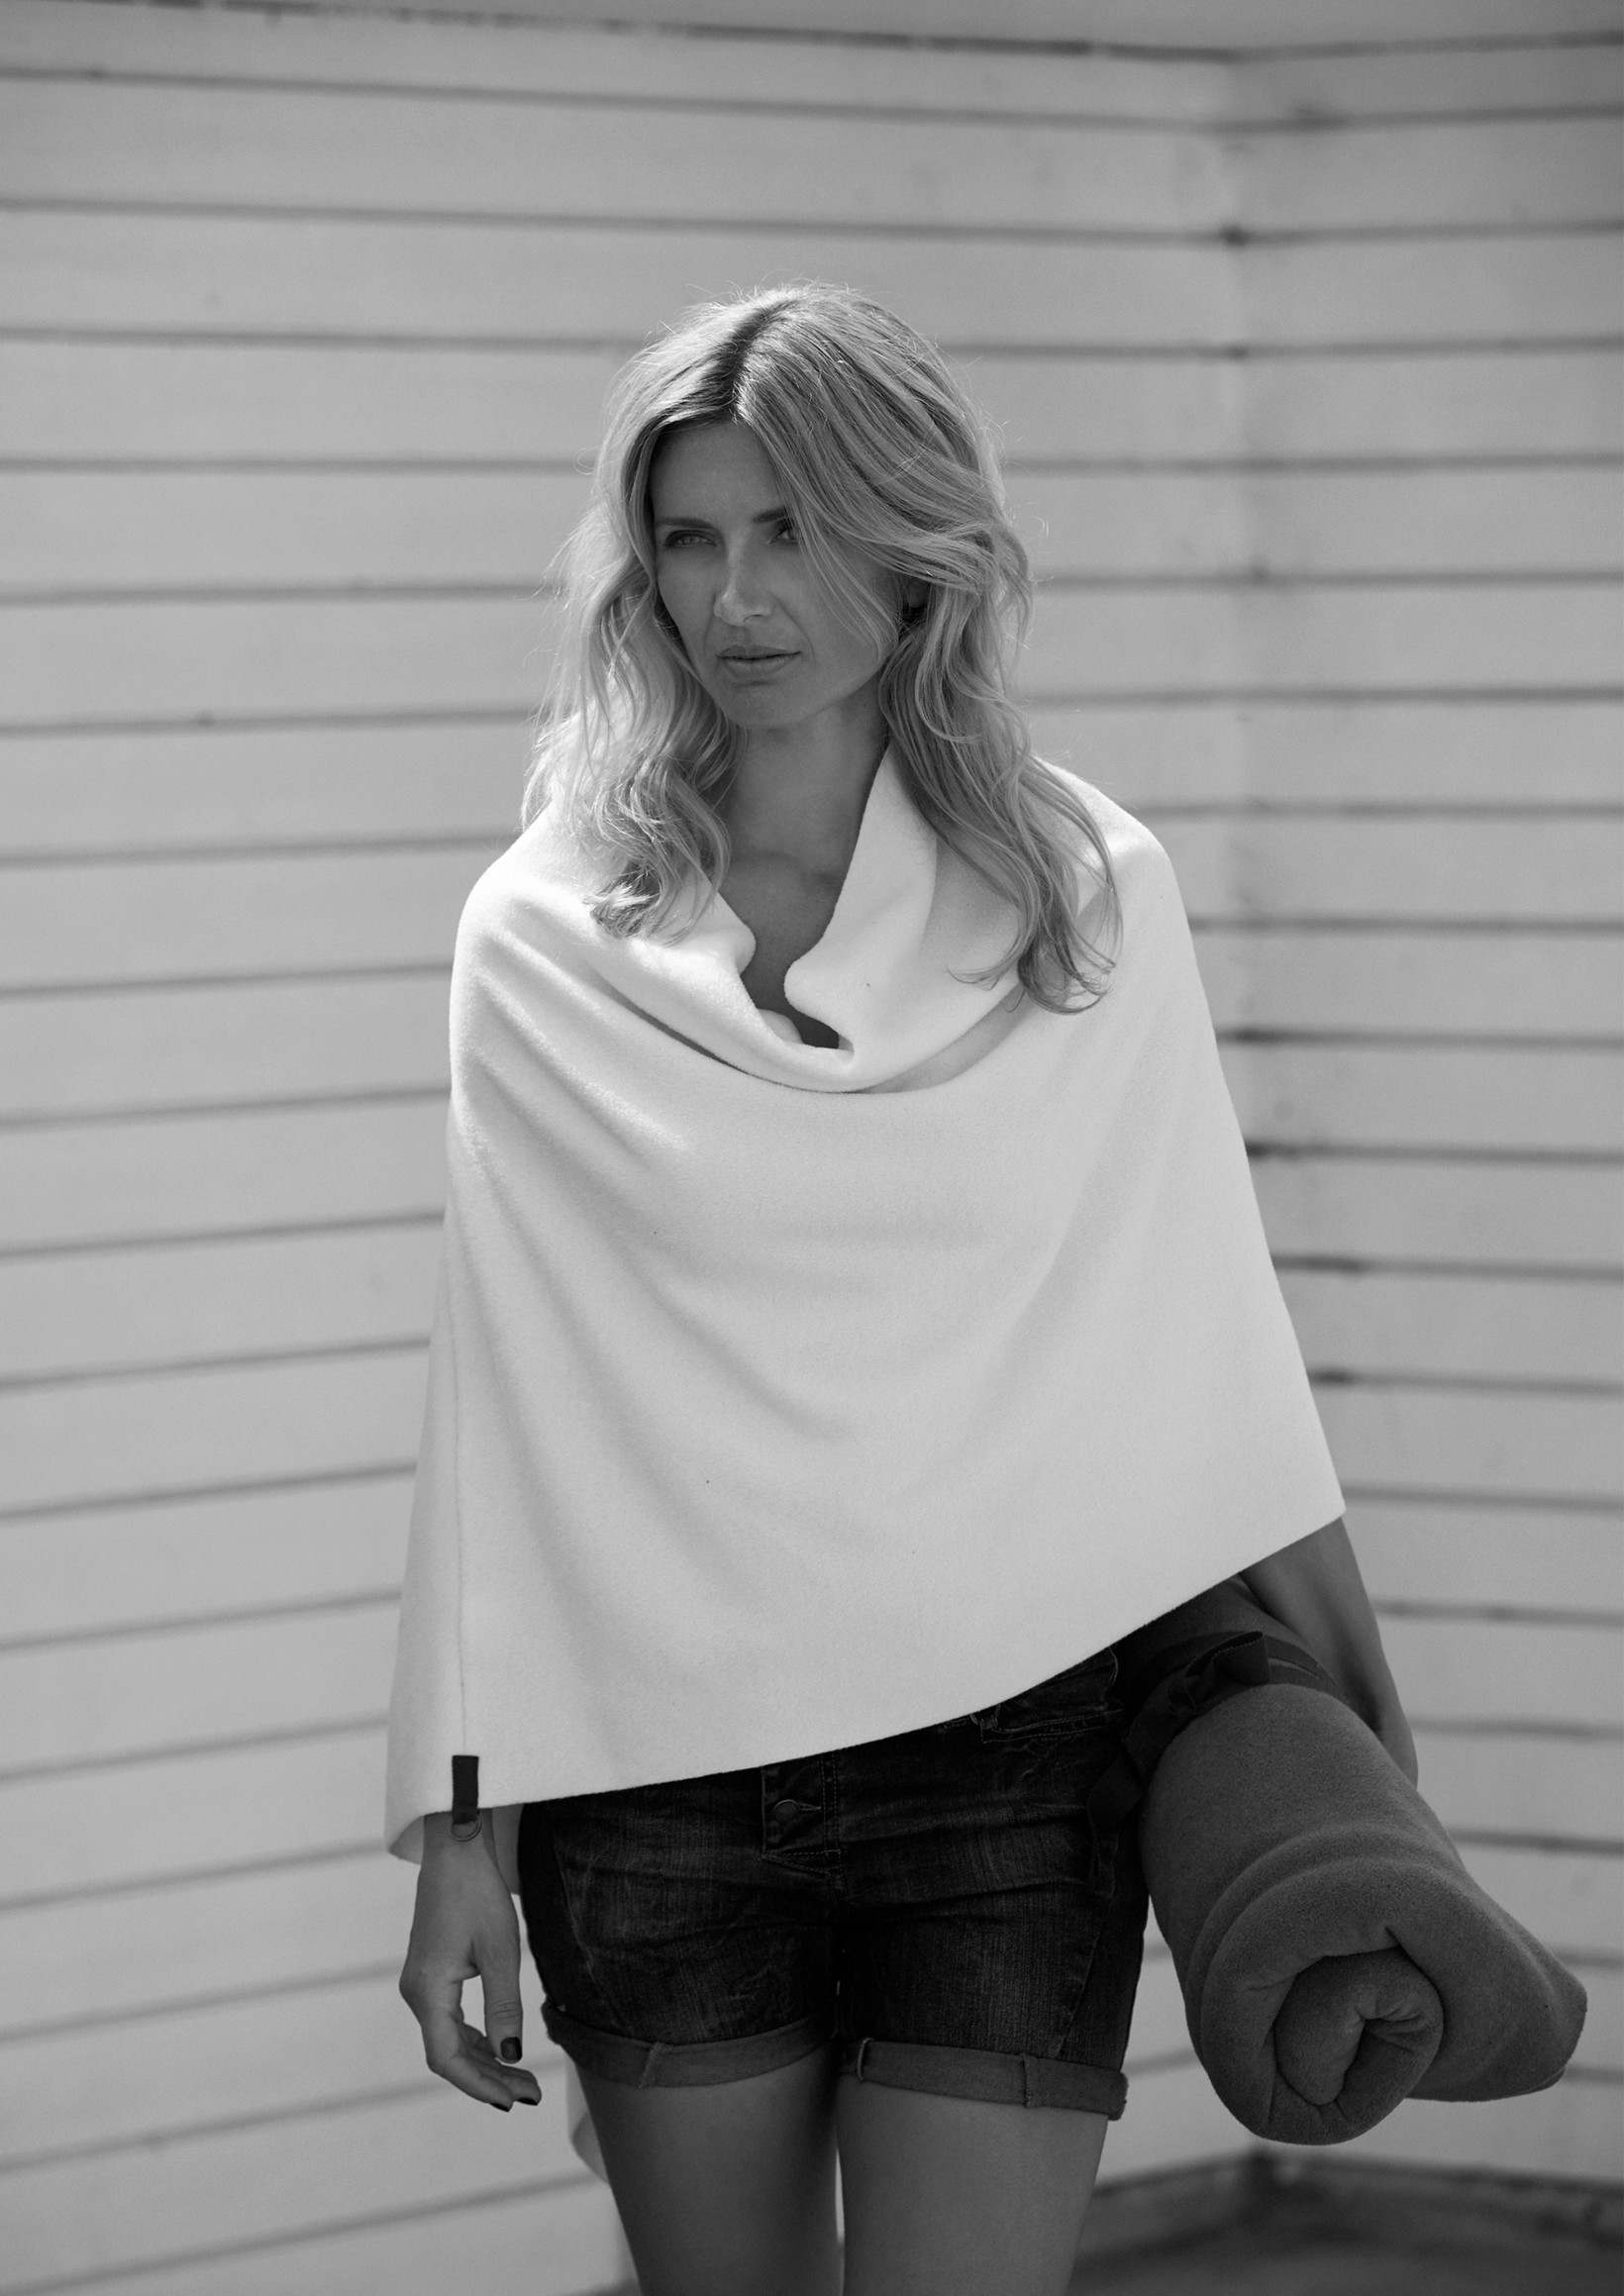 b520ae965f71 Buy Henriette Steffensen Fleece Coat online HENRIETTE STEFFENSEN Copenhagen  4026 PONCHO O ...